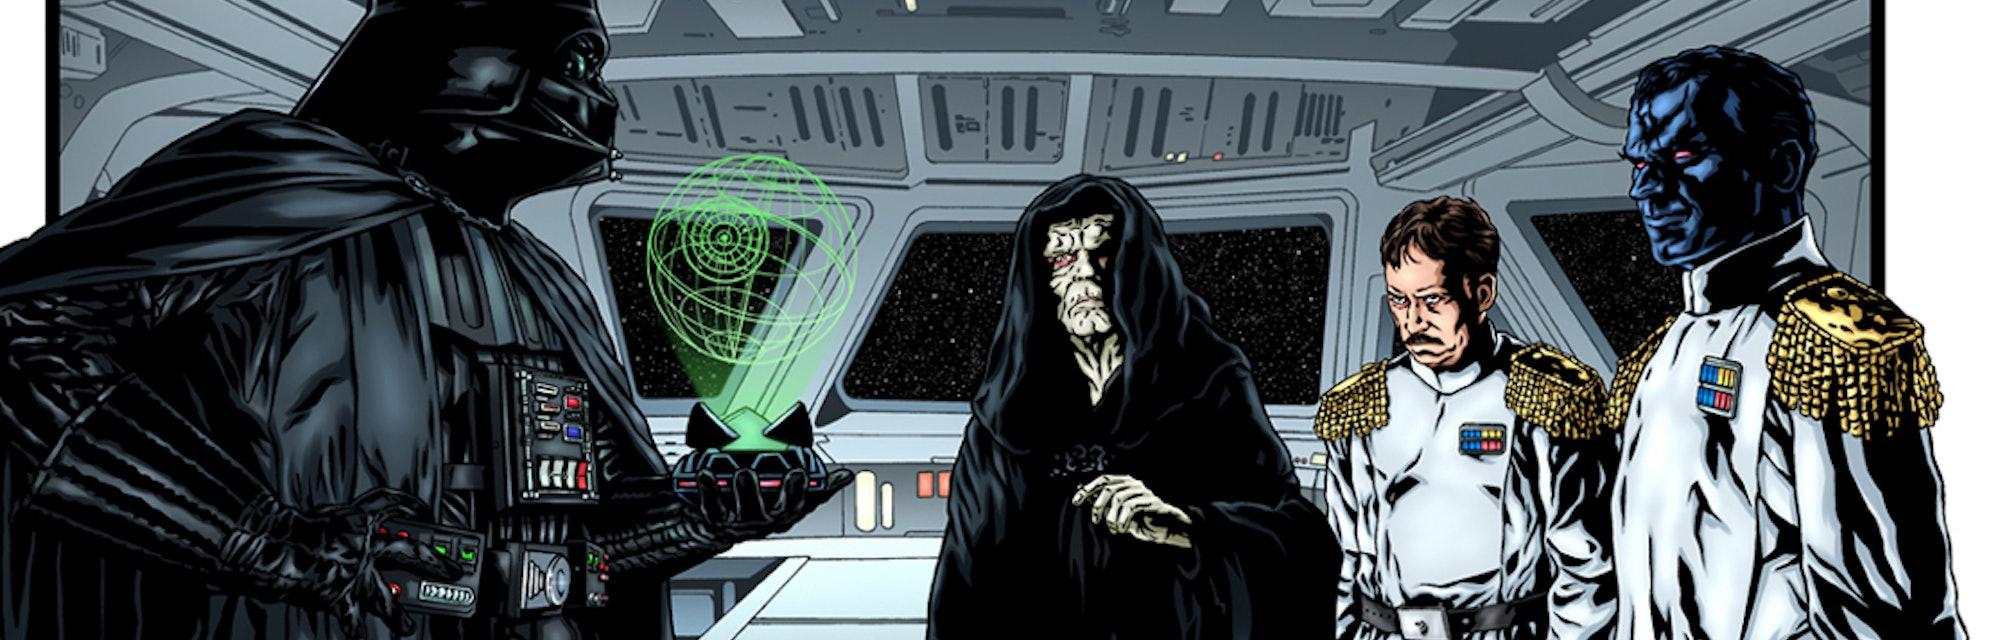 Star Wars Rise Of Skywalker Spoilers New Book Teases Death Star Twist